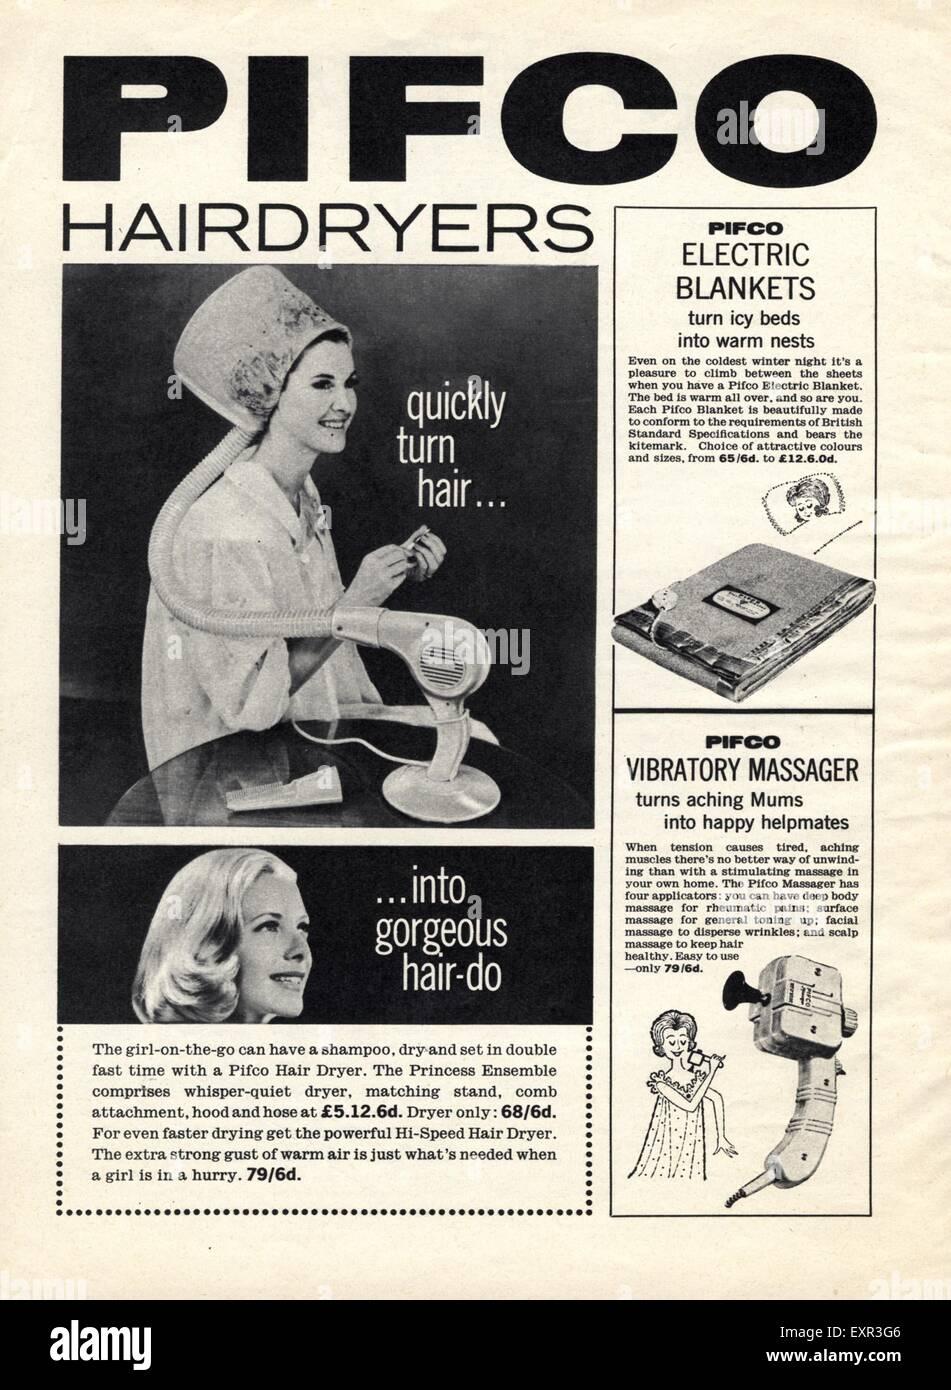 1950s UK Pifco Hairdryers Magazine Advert Stock Photo - Alamy